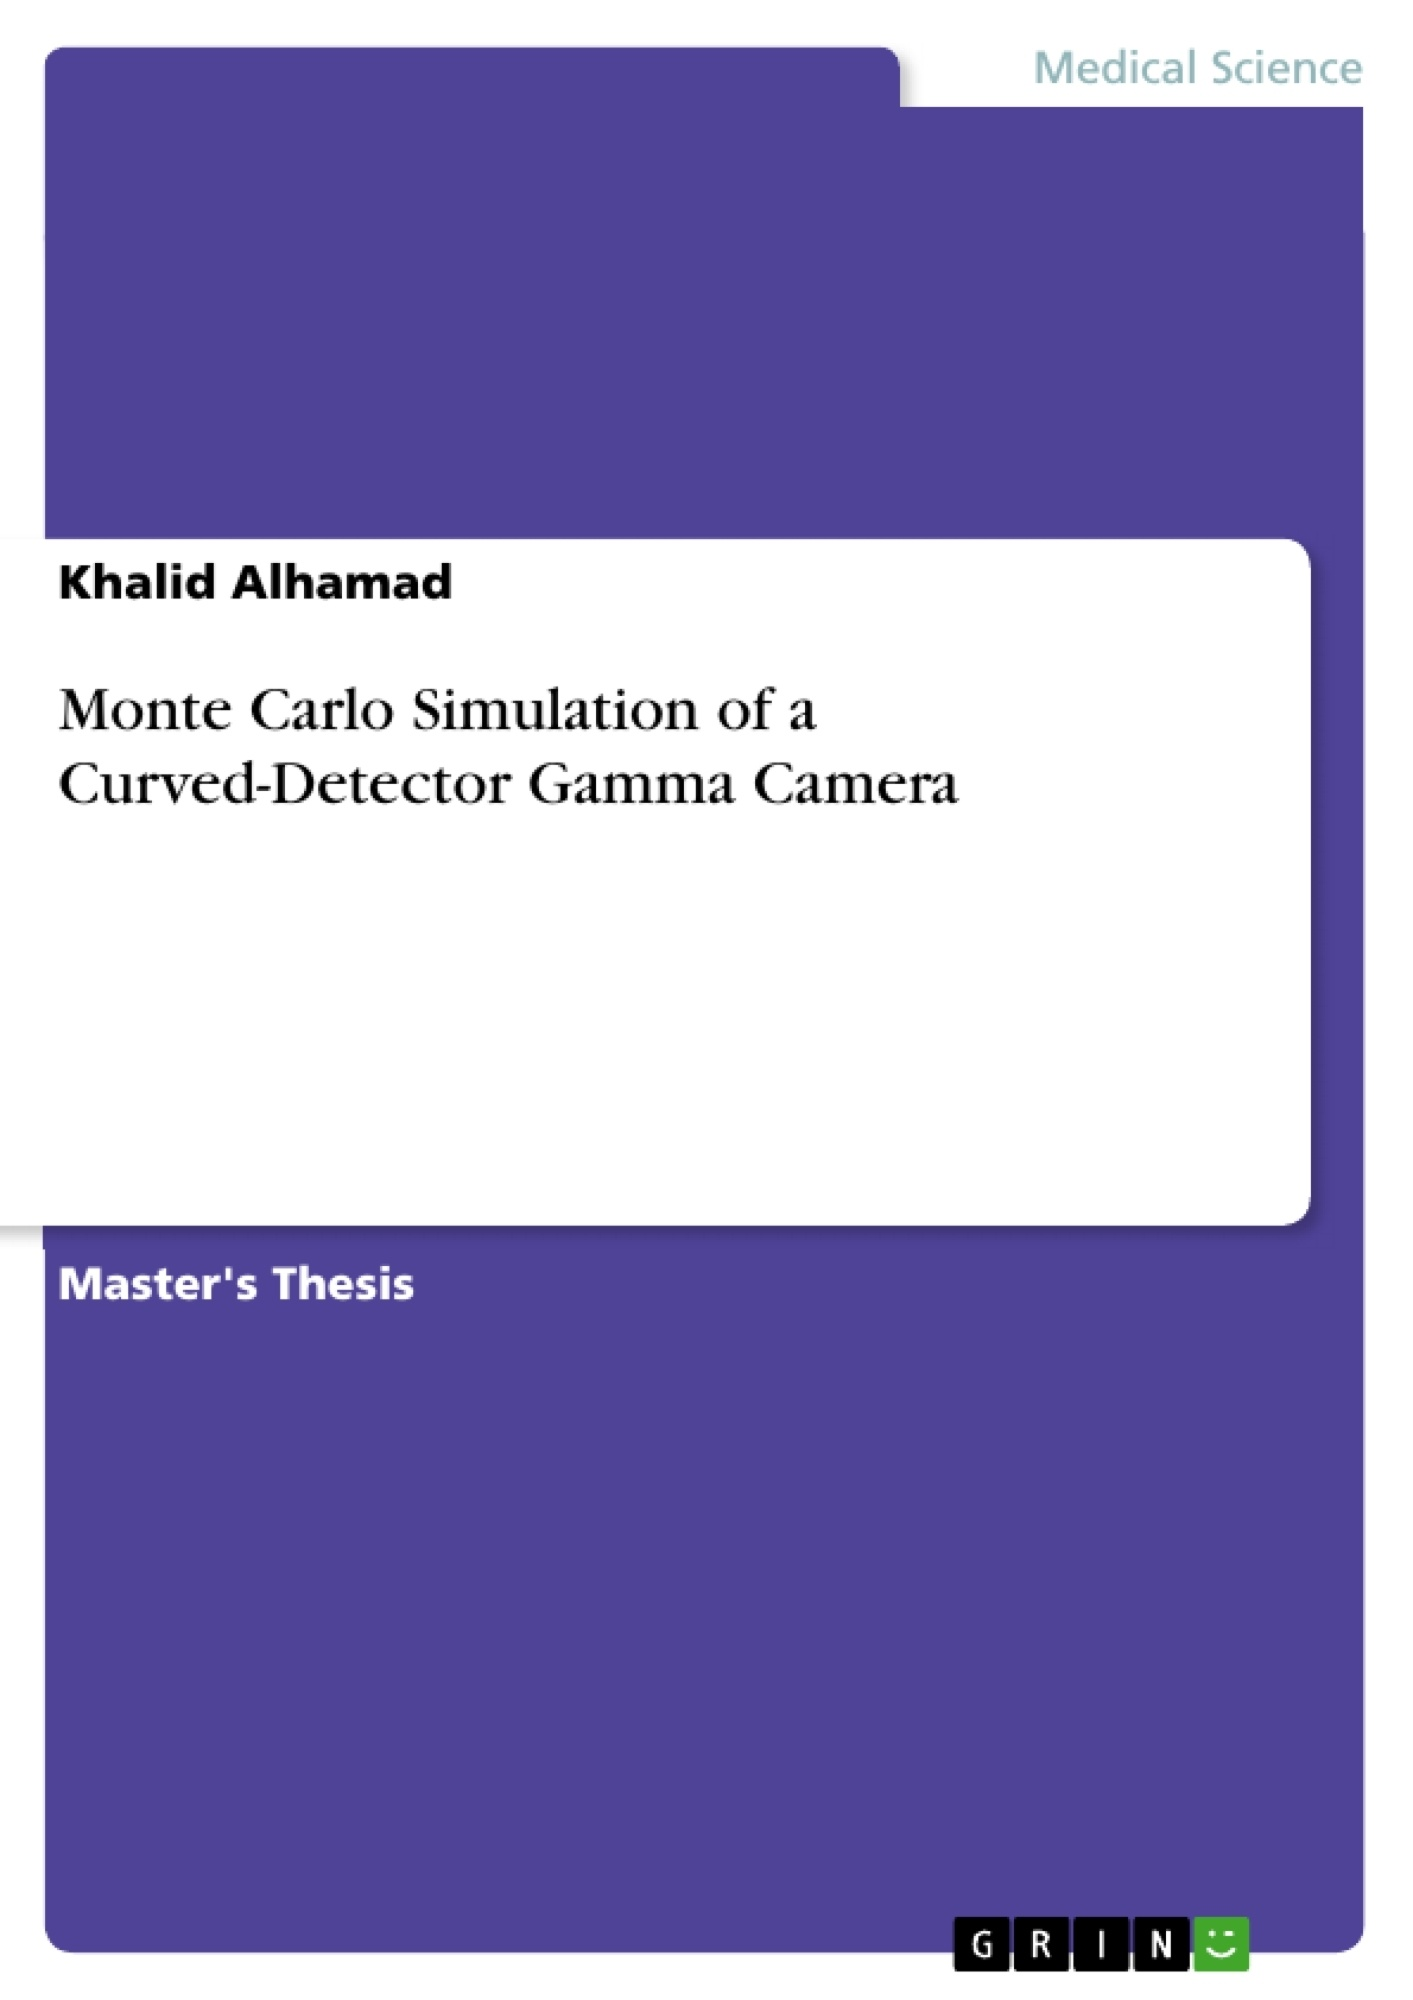 Title: Monte Carlo Simulation of a Curved-Detector Gamma Camera